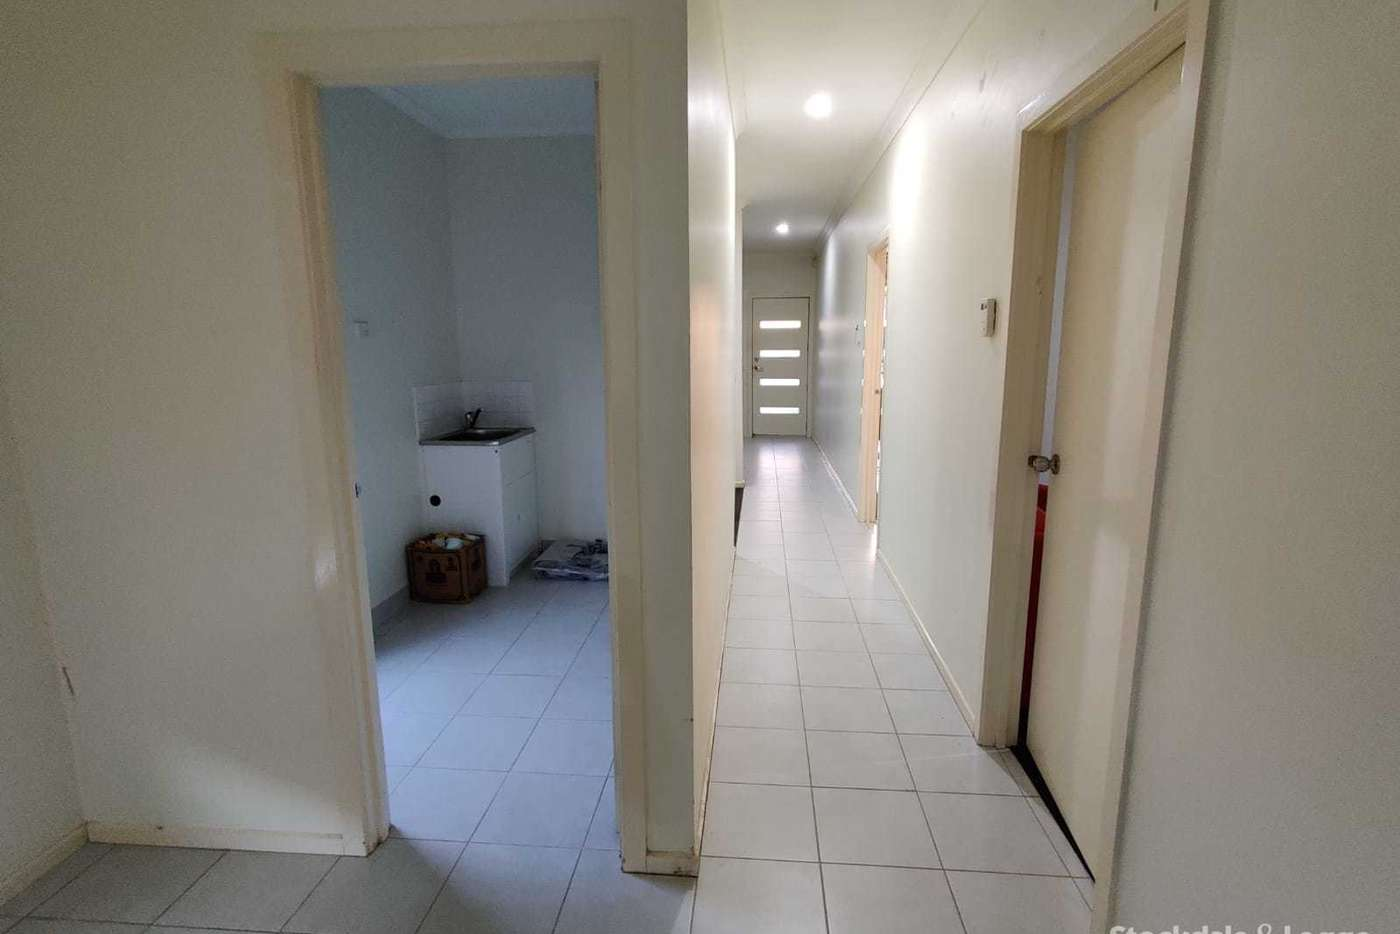 Seventh view of Homely house listing, 22 Surveyor Street, Wyndham Vale VIC 3024